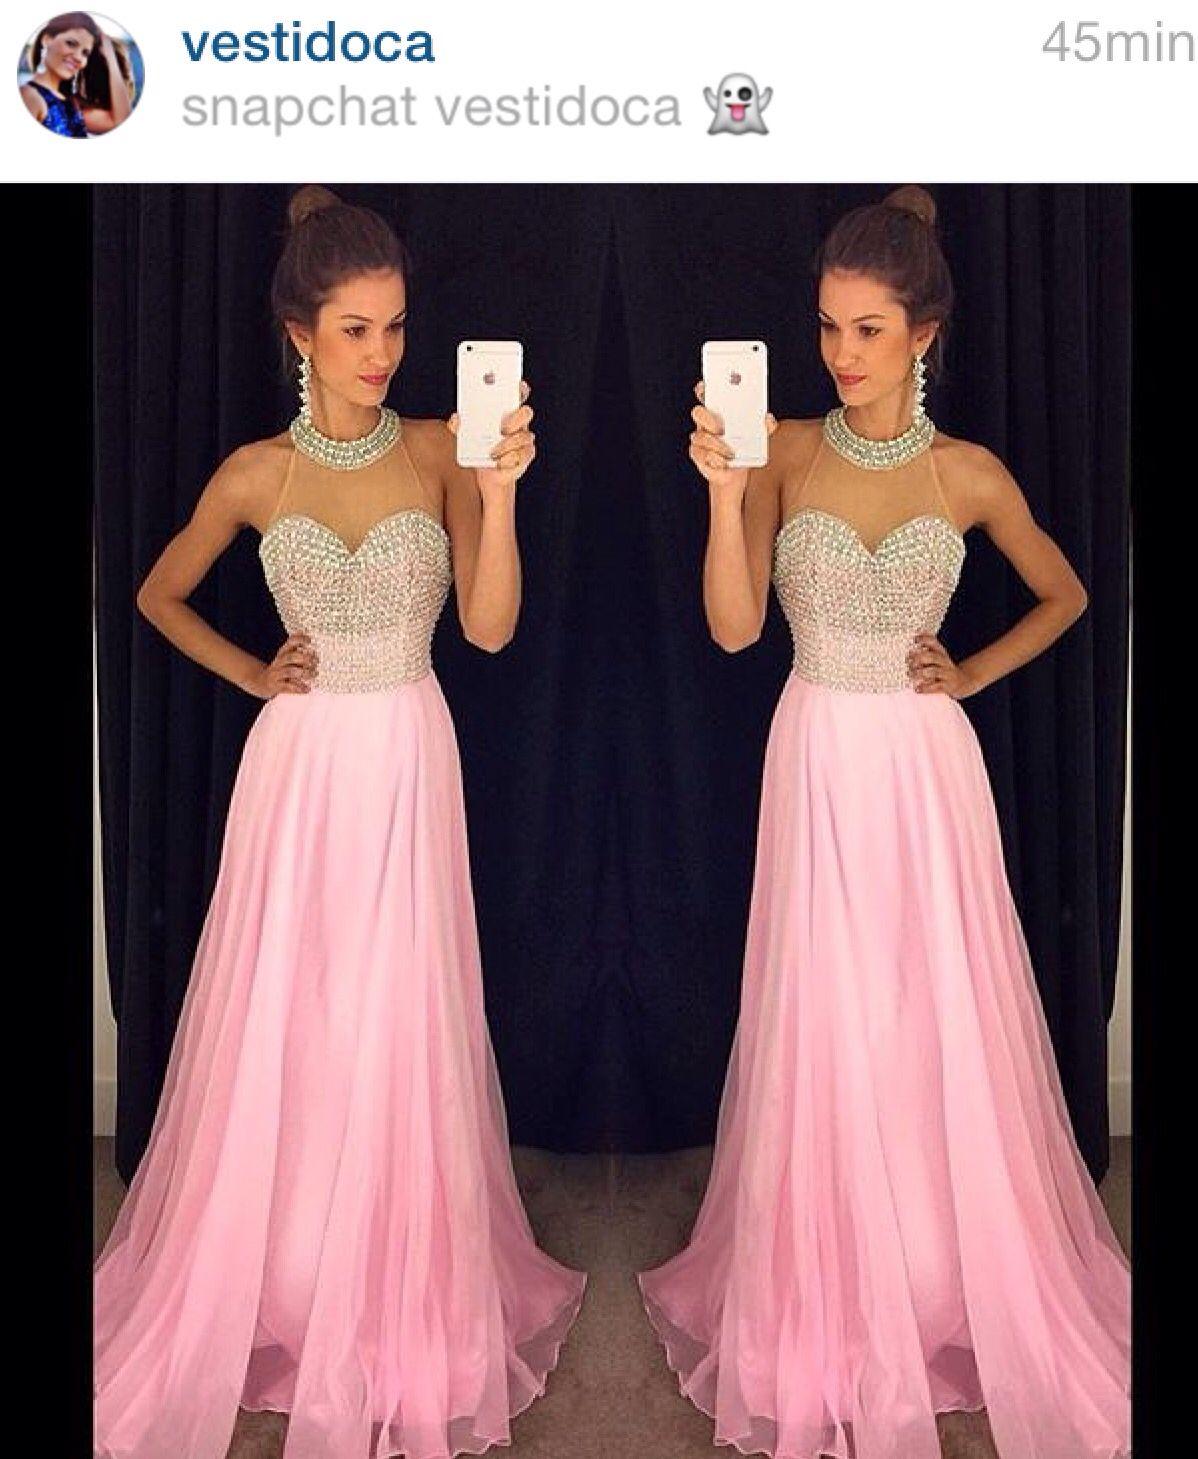 inspiracao #instagram | Instagram - inspirações | Pinterest